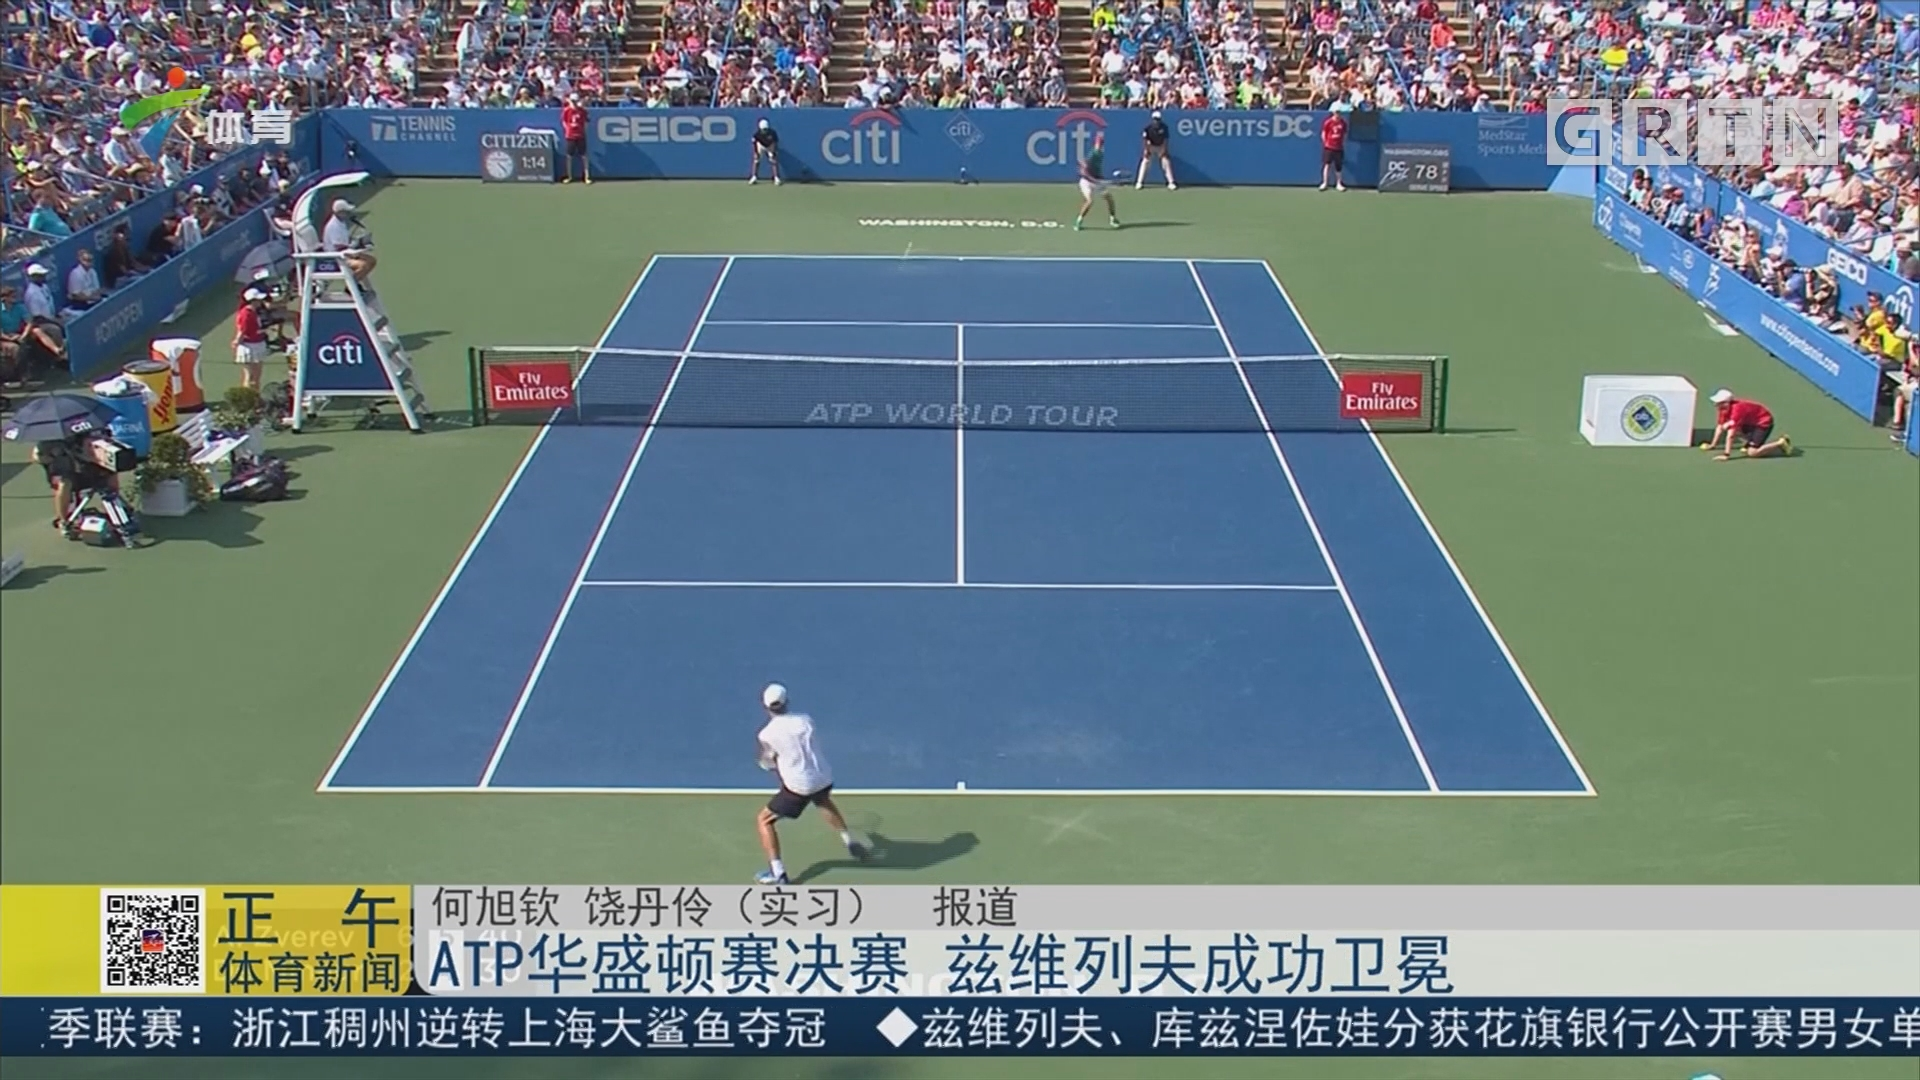 ATP华盛顿赛决赛 兹维列夫成功卫冕